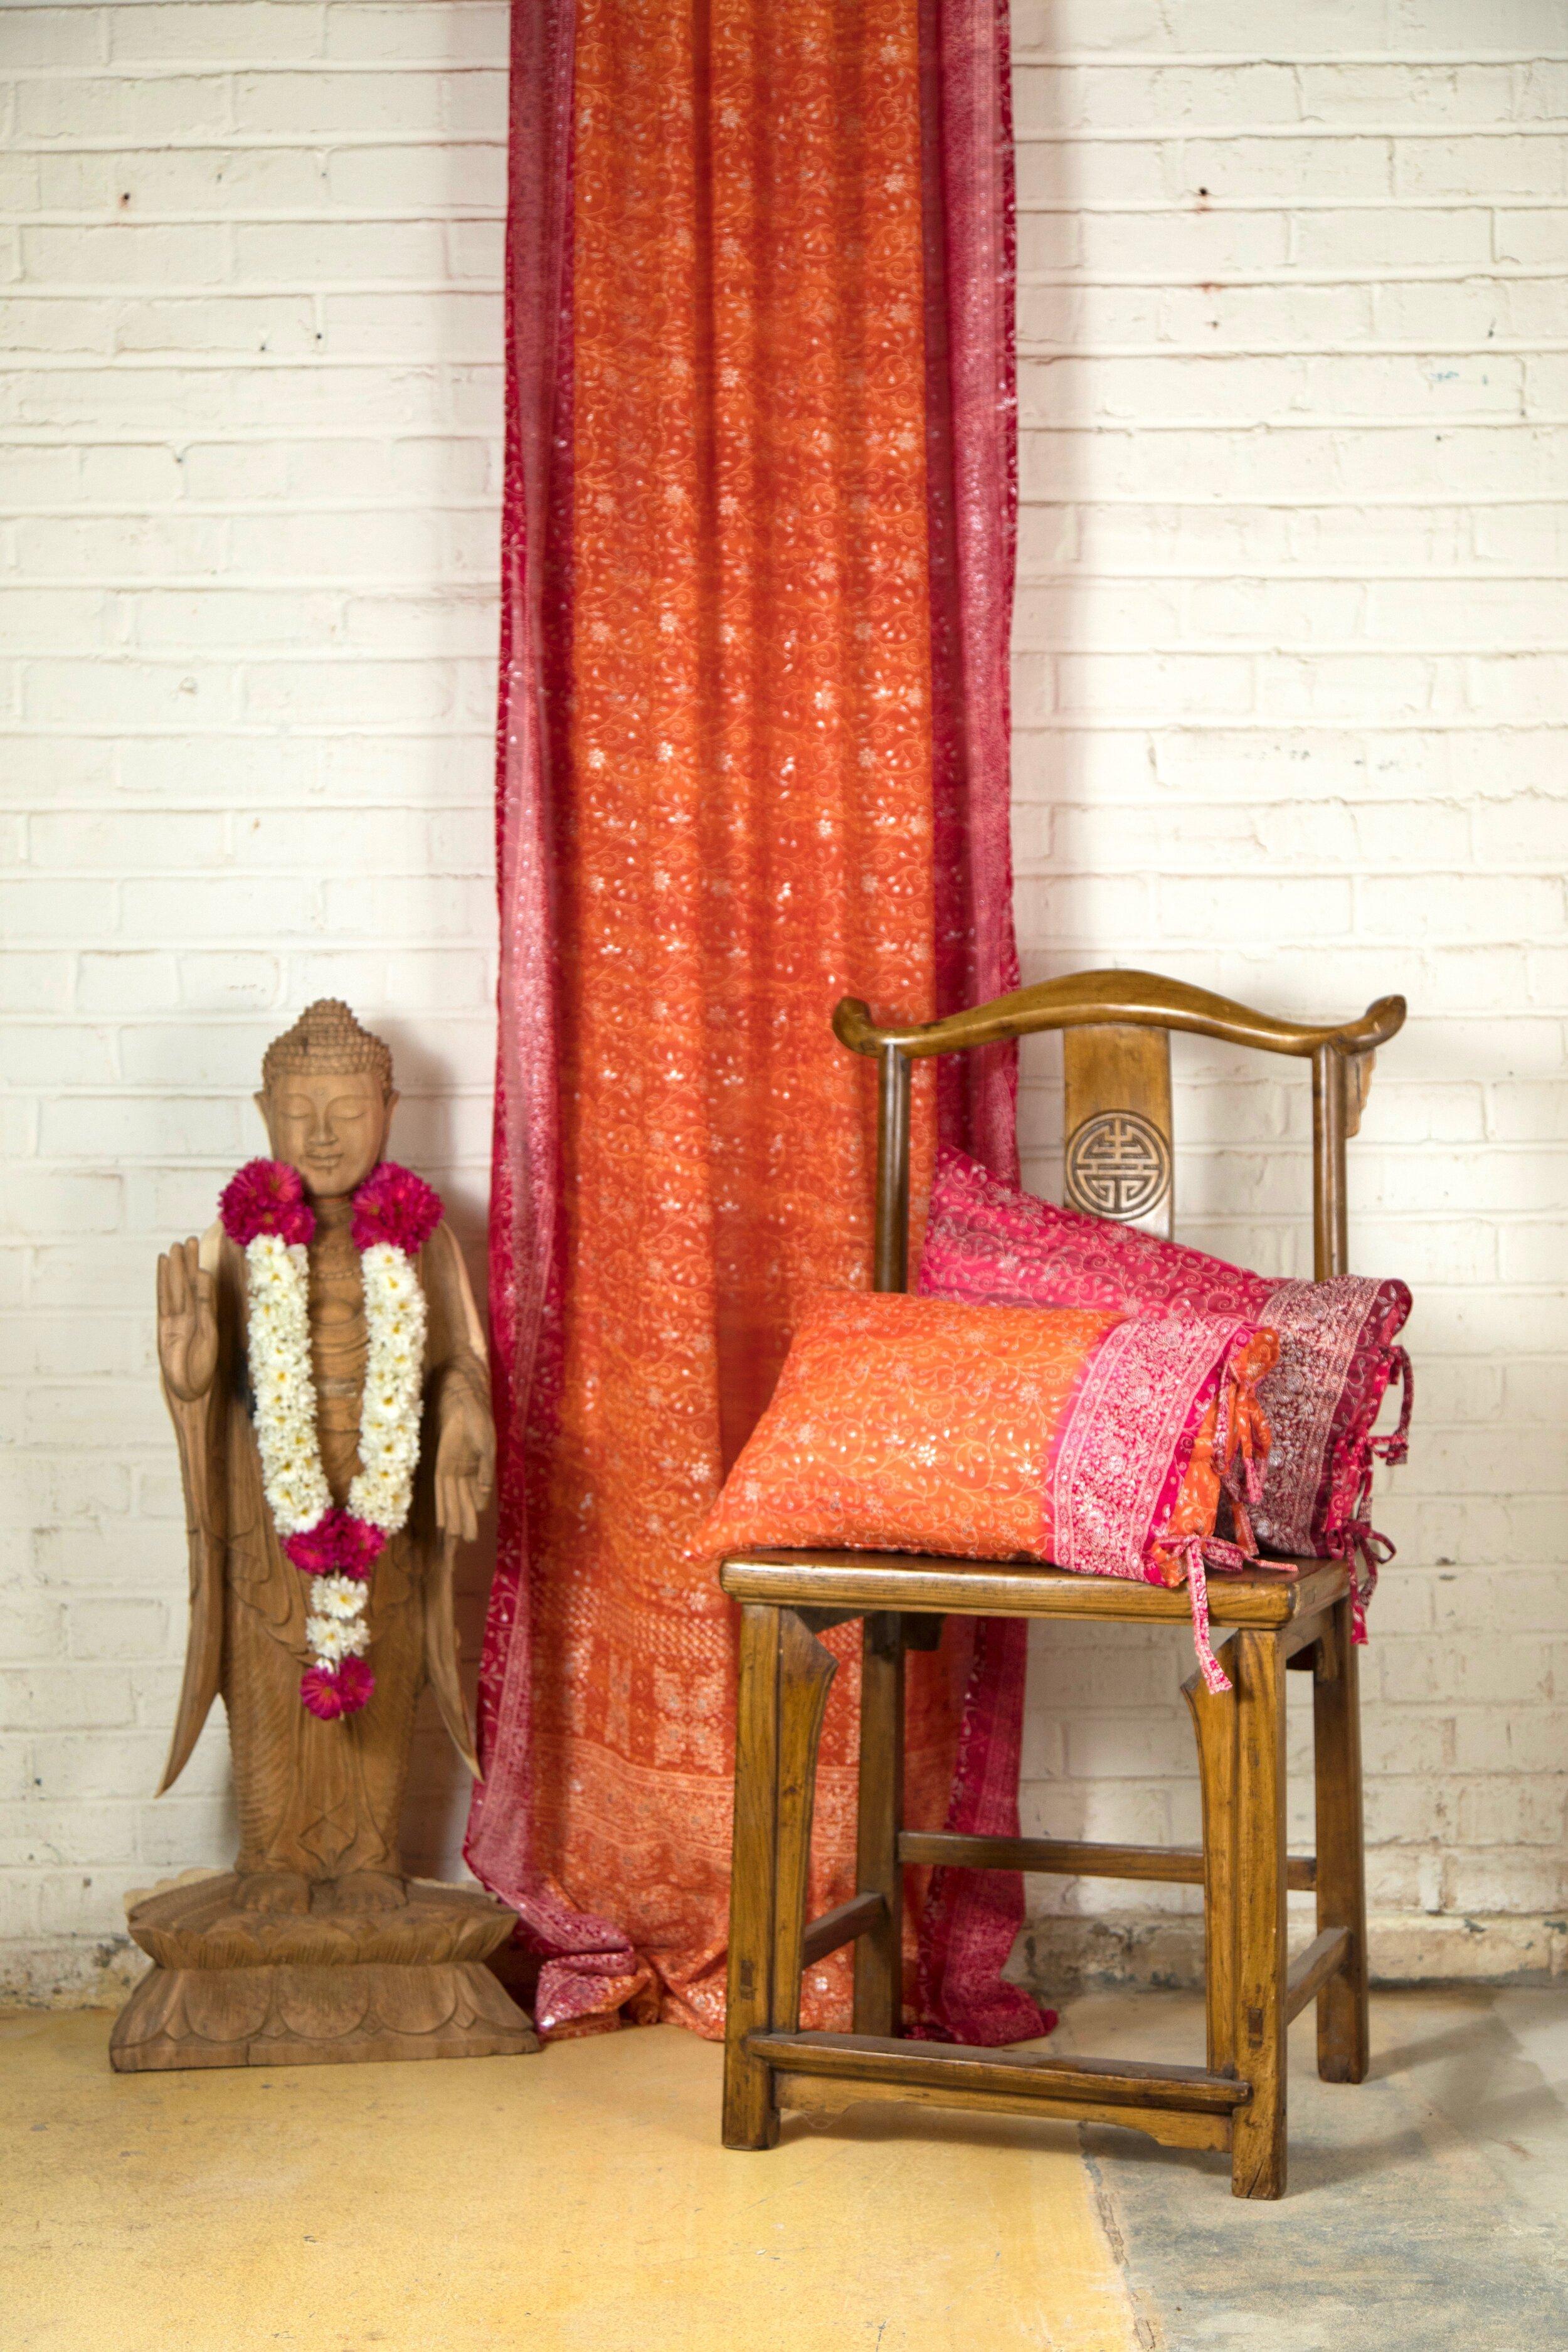 Sari Window Curtain Orange Crimson Pink Colors By Padmini